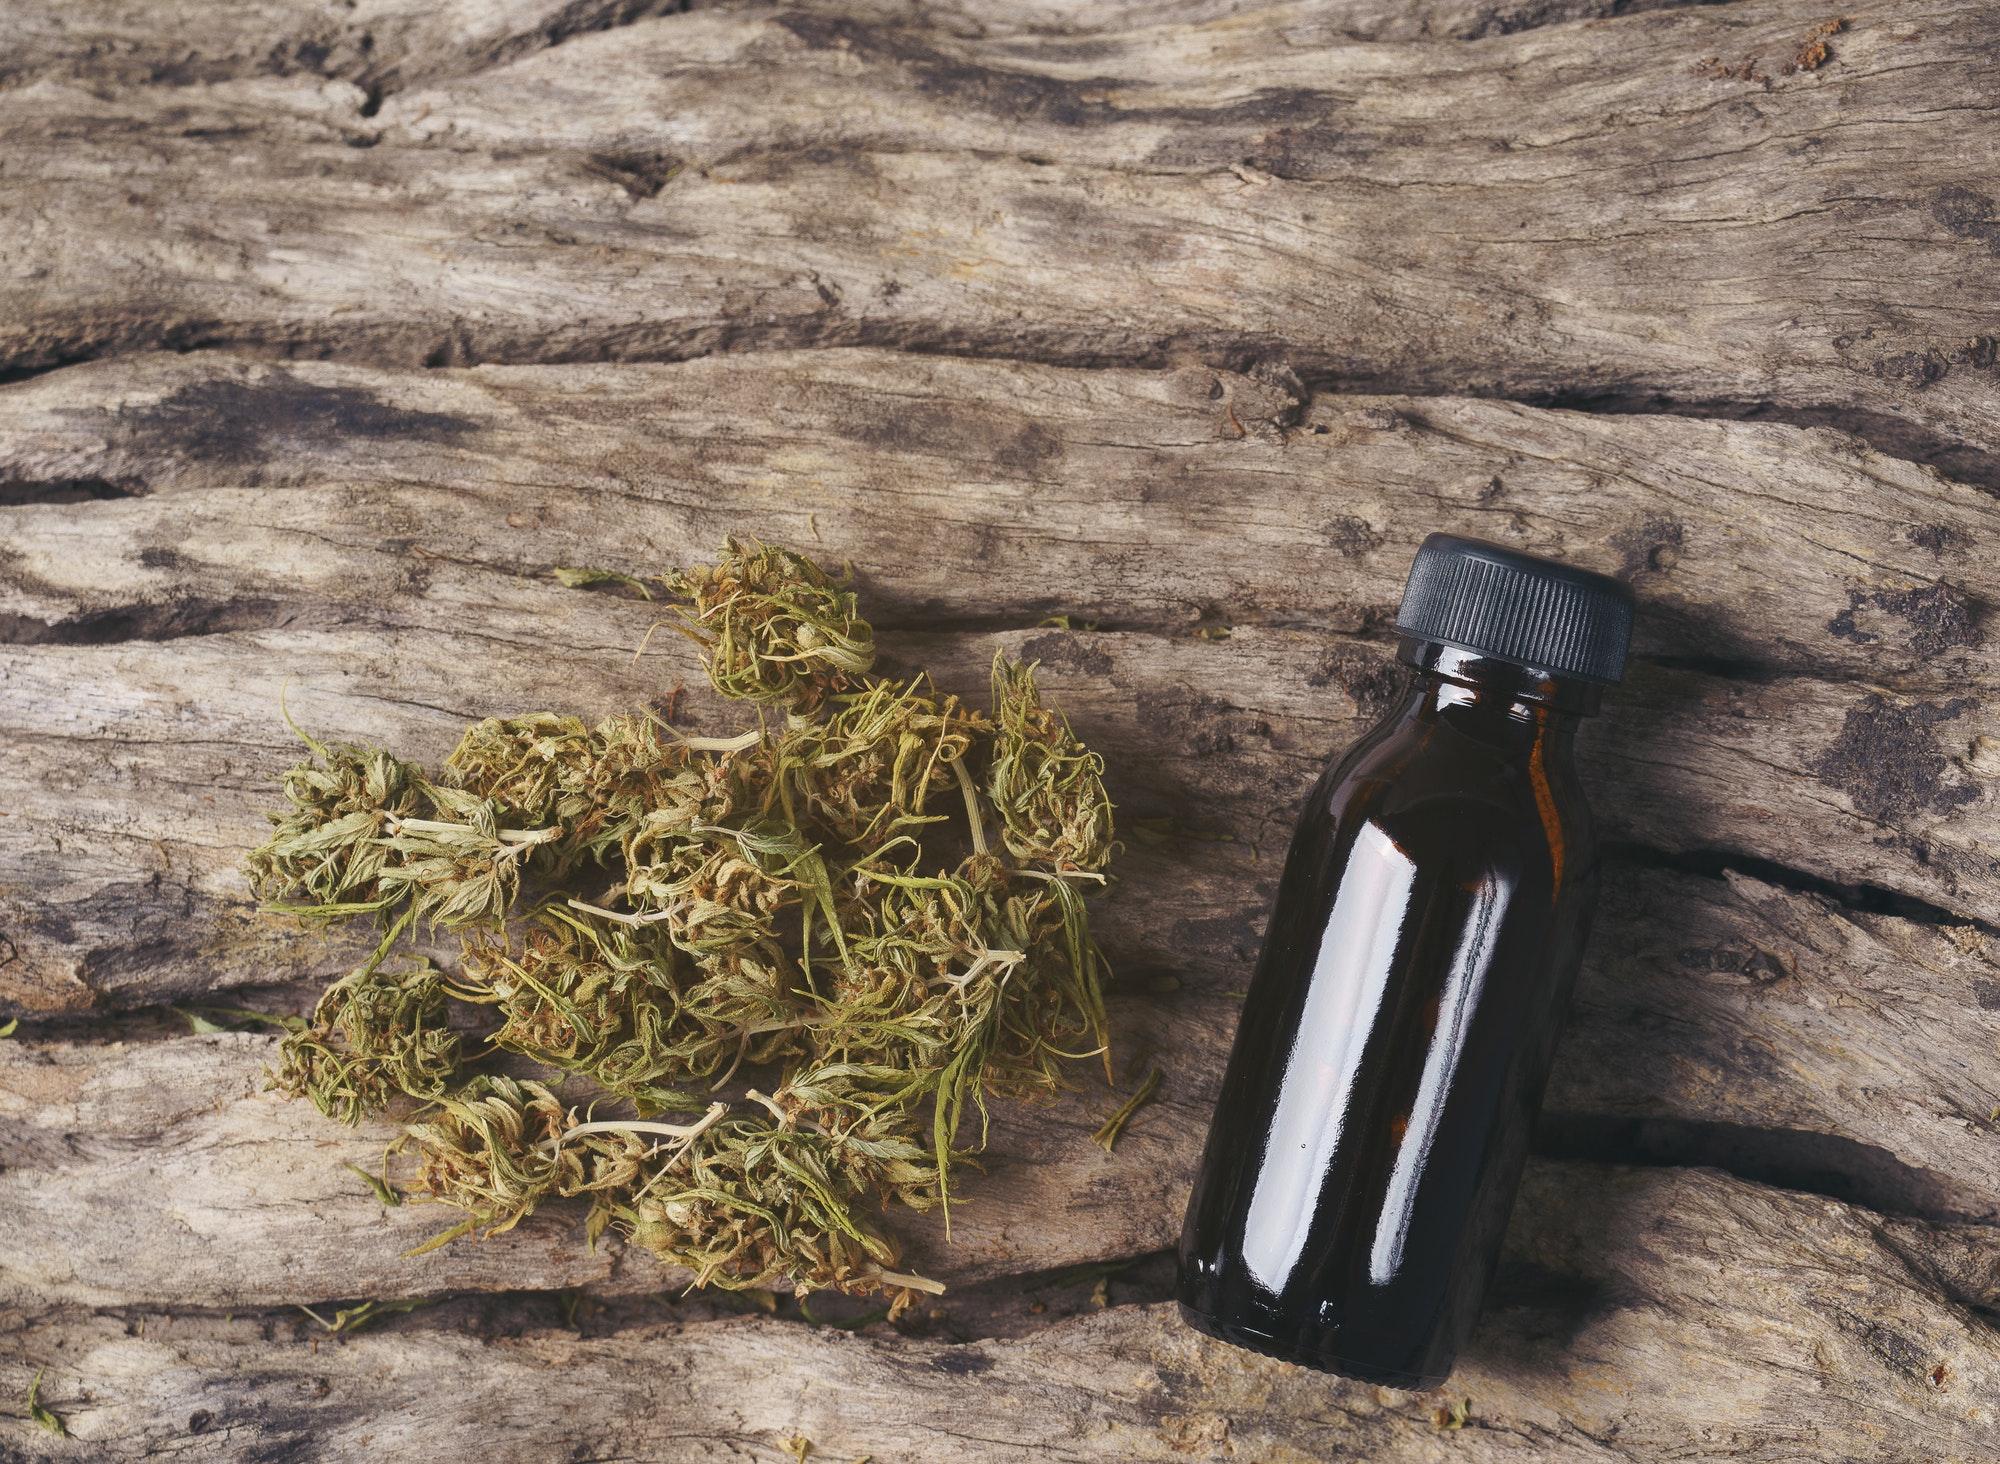 dried medical marijuana with CBD and THC extract